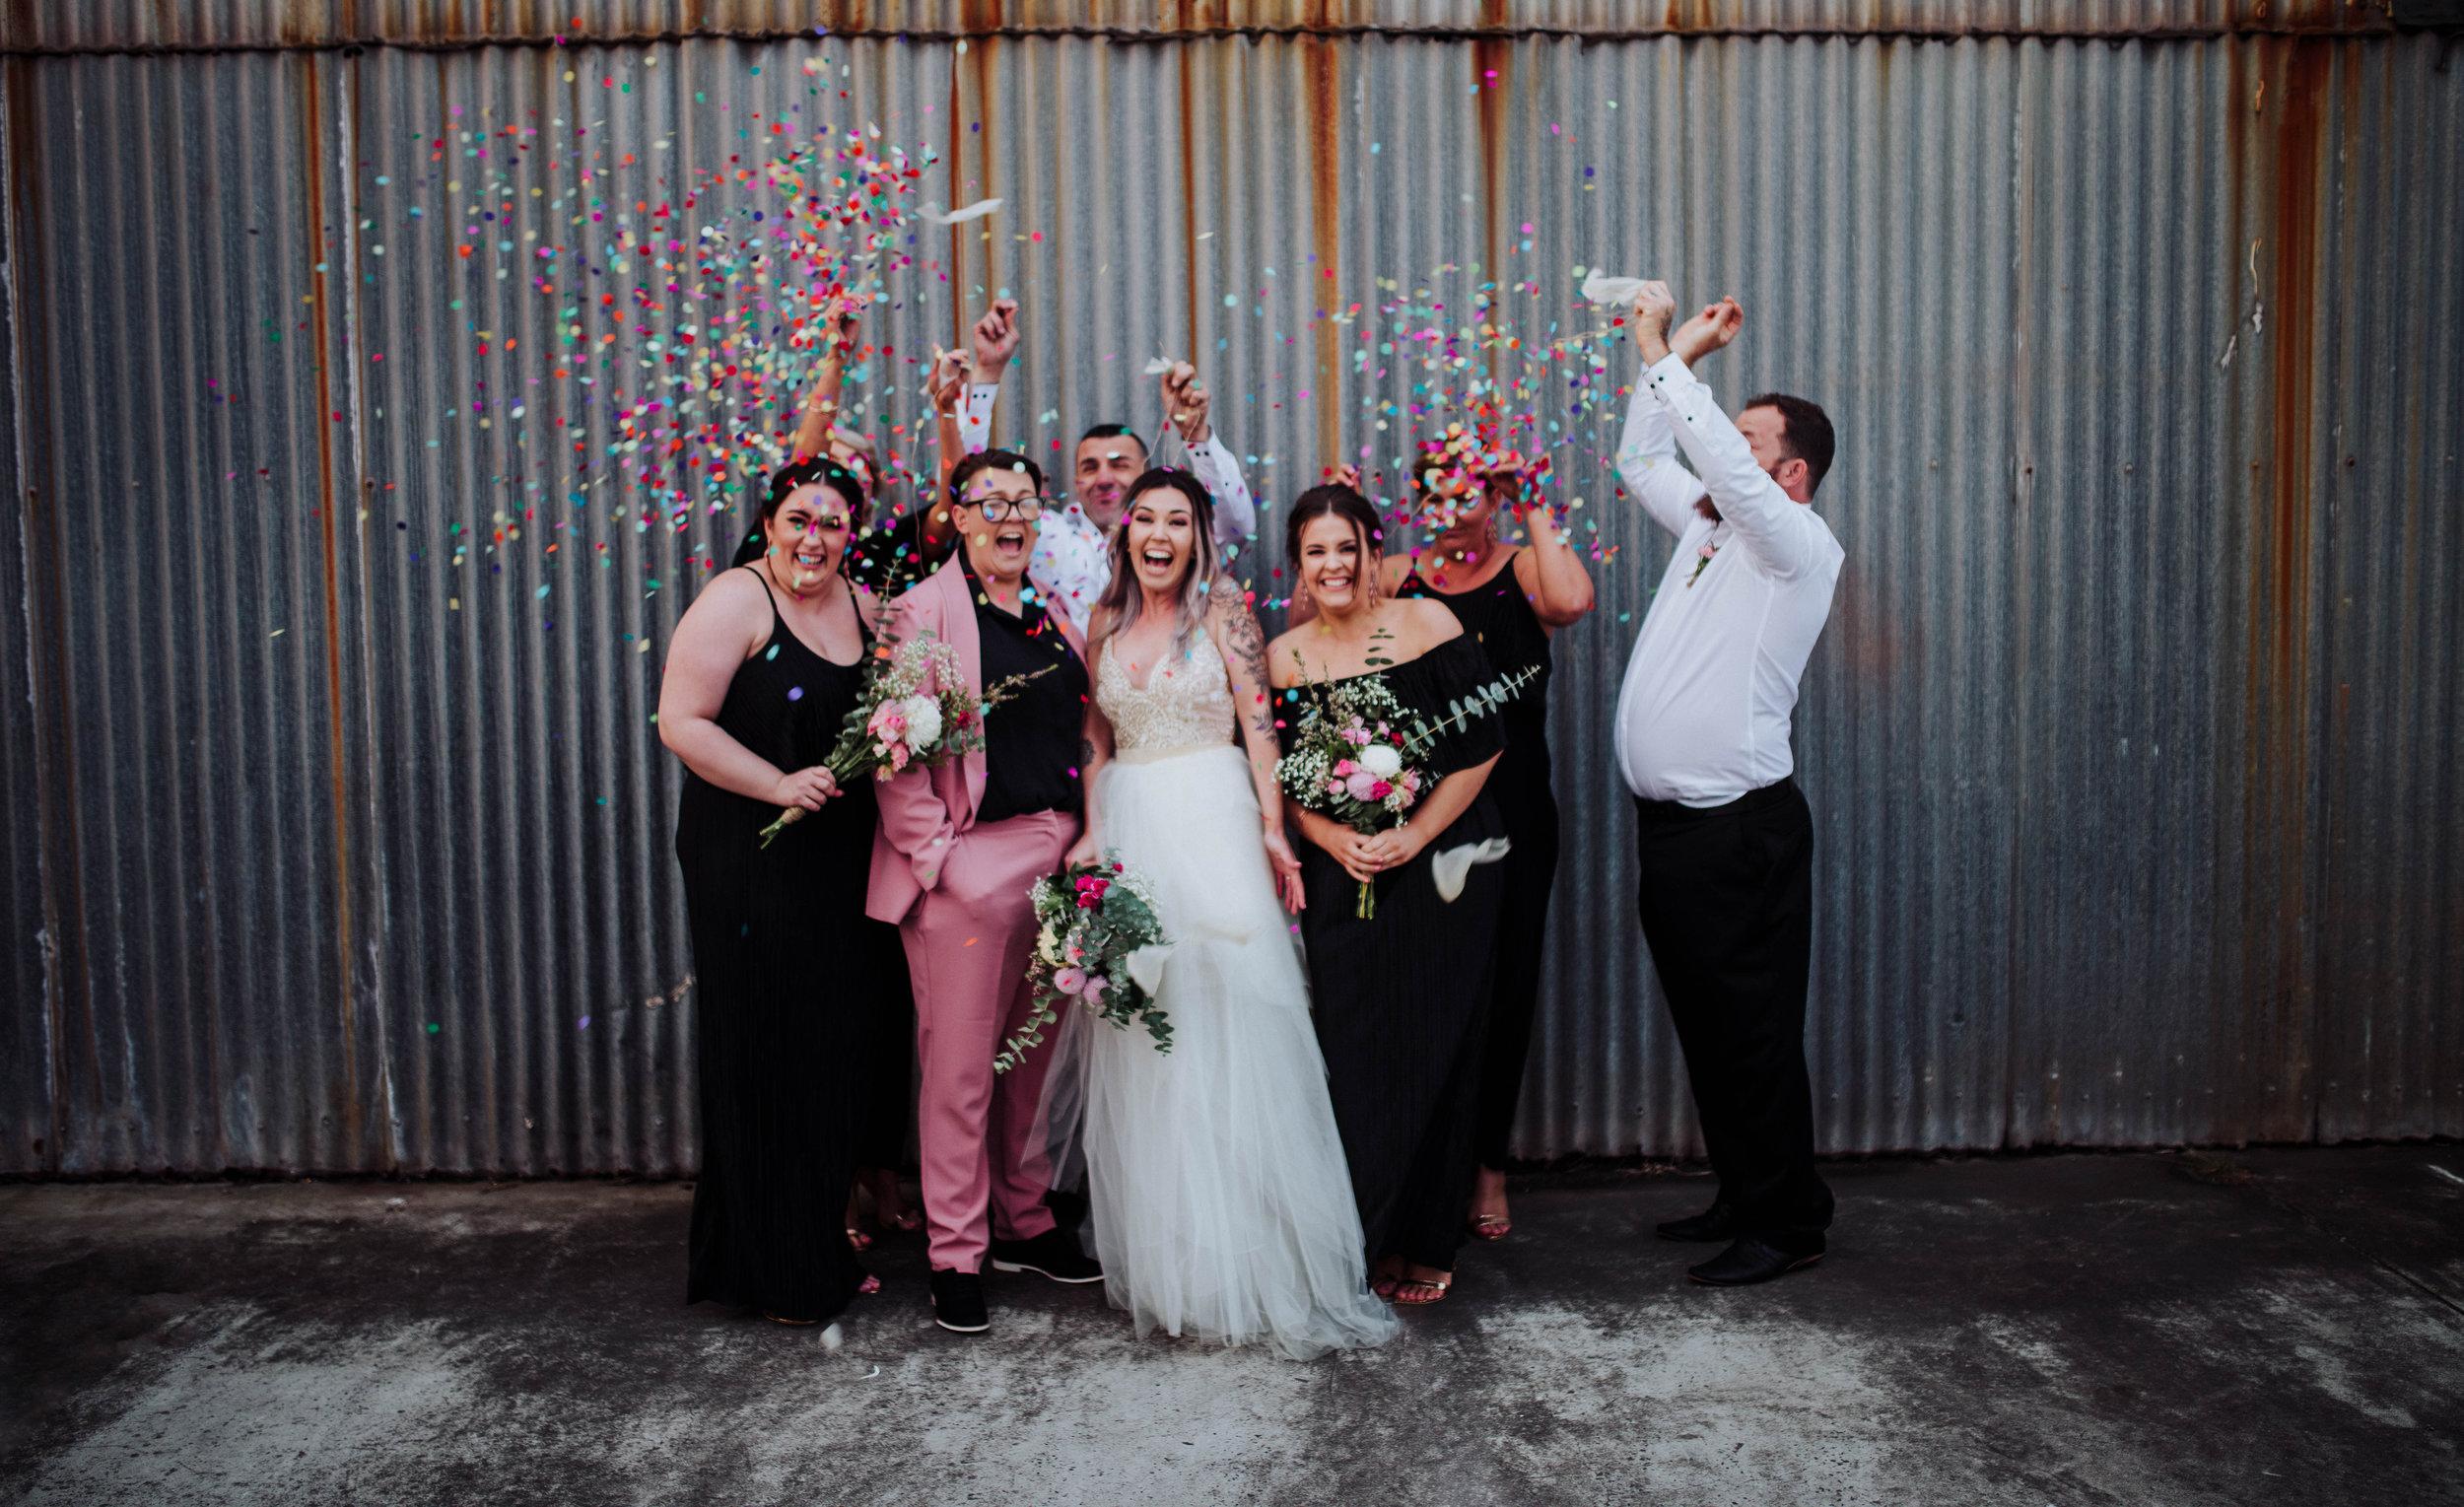 Reanna & Emma - Wollongong Wedding     16th September 2017